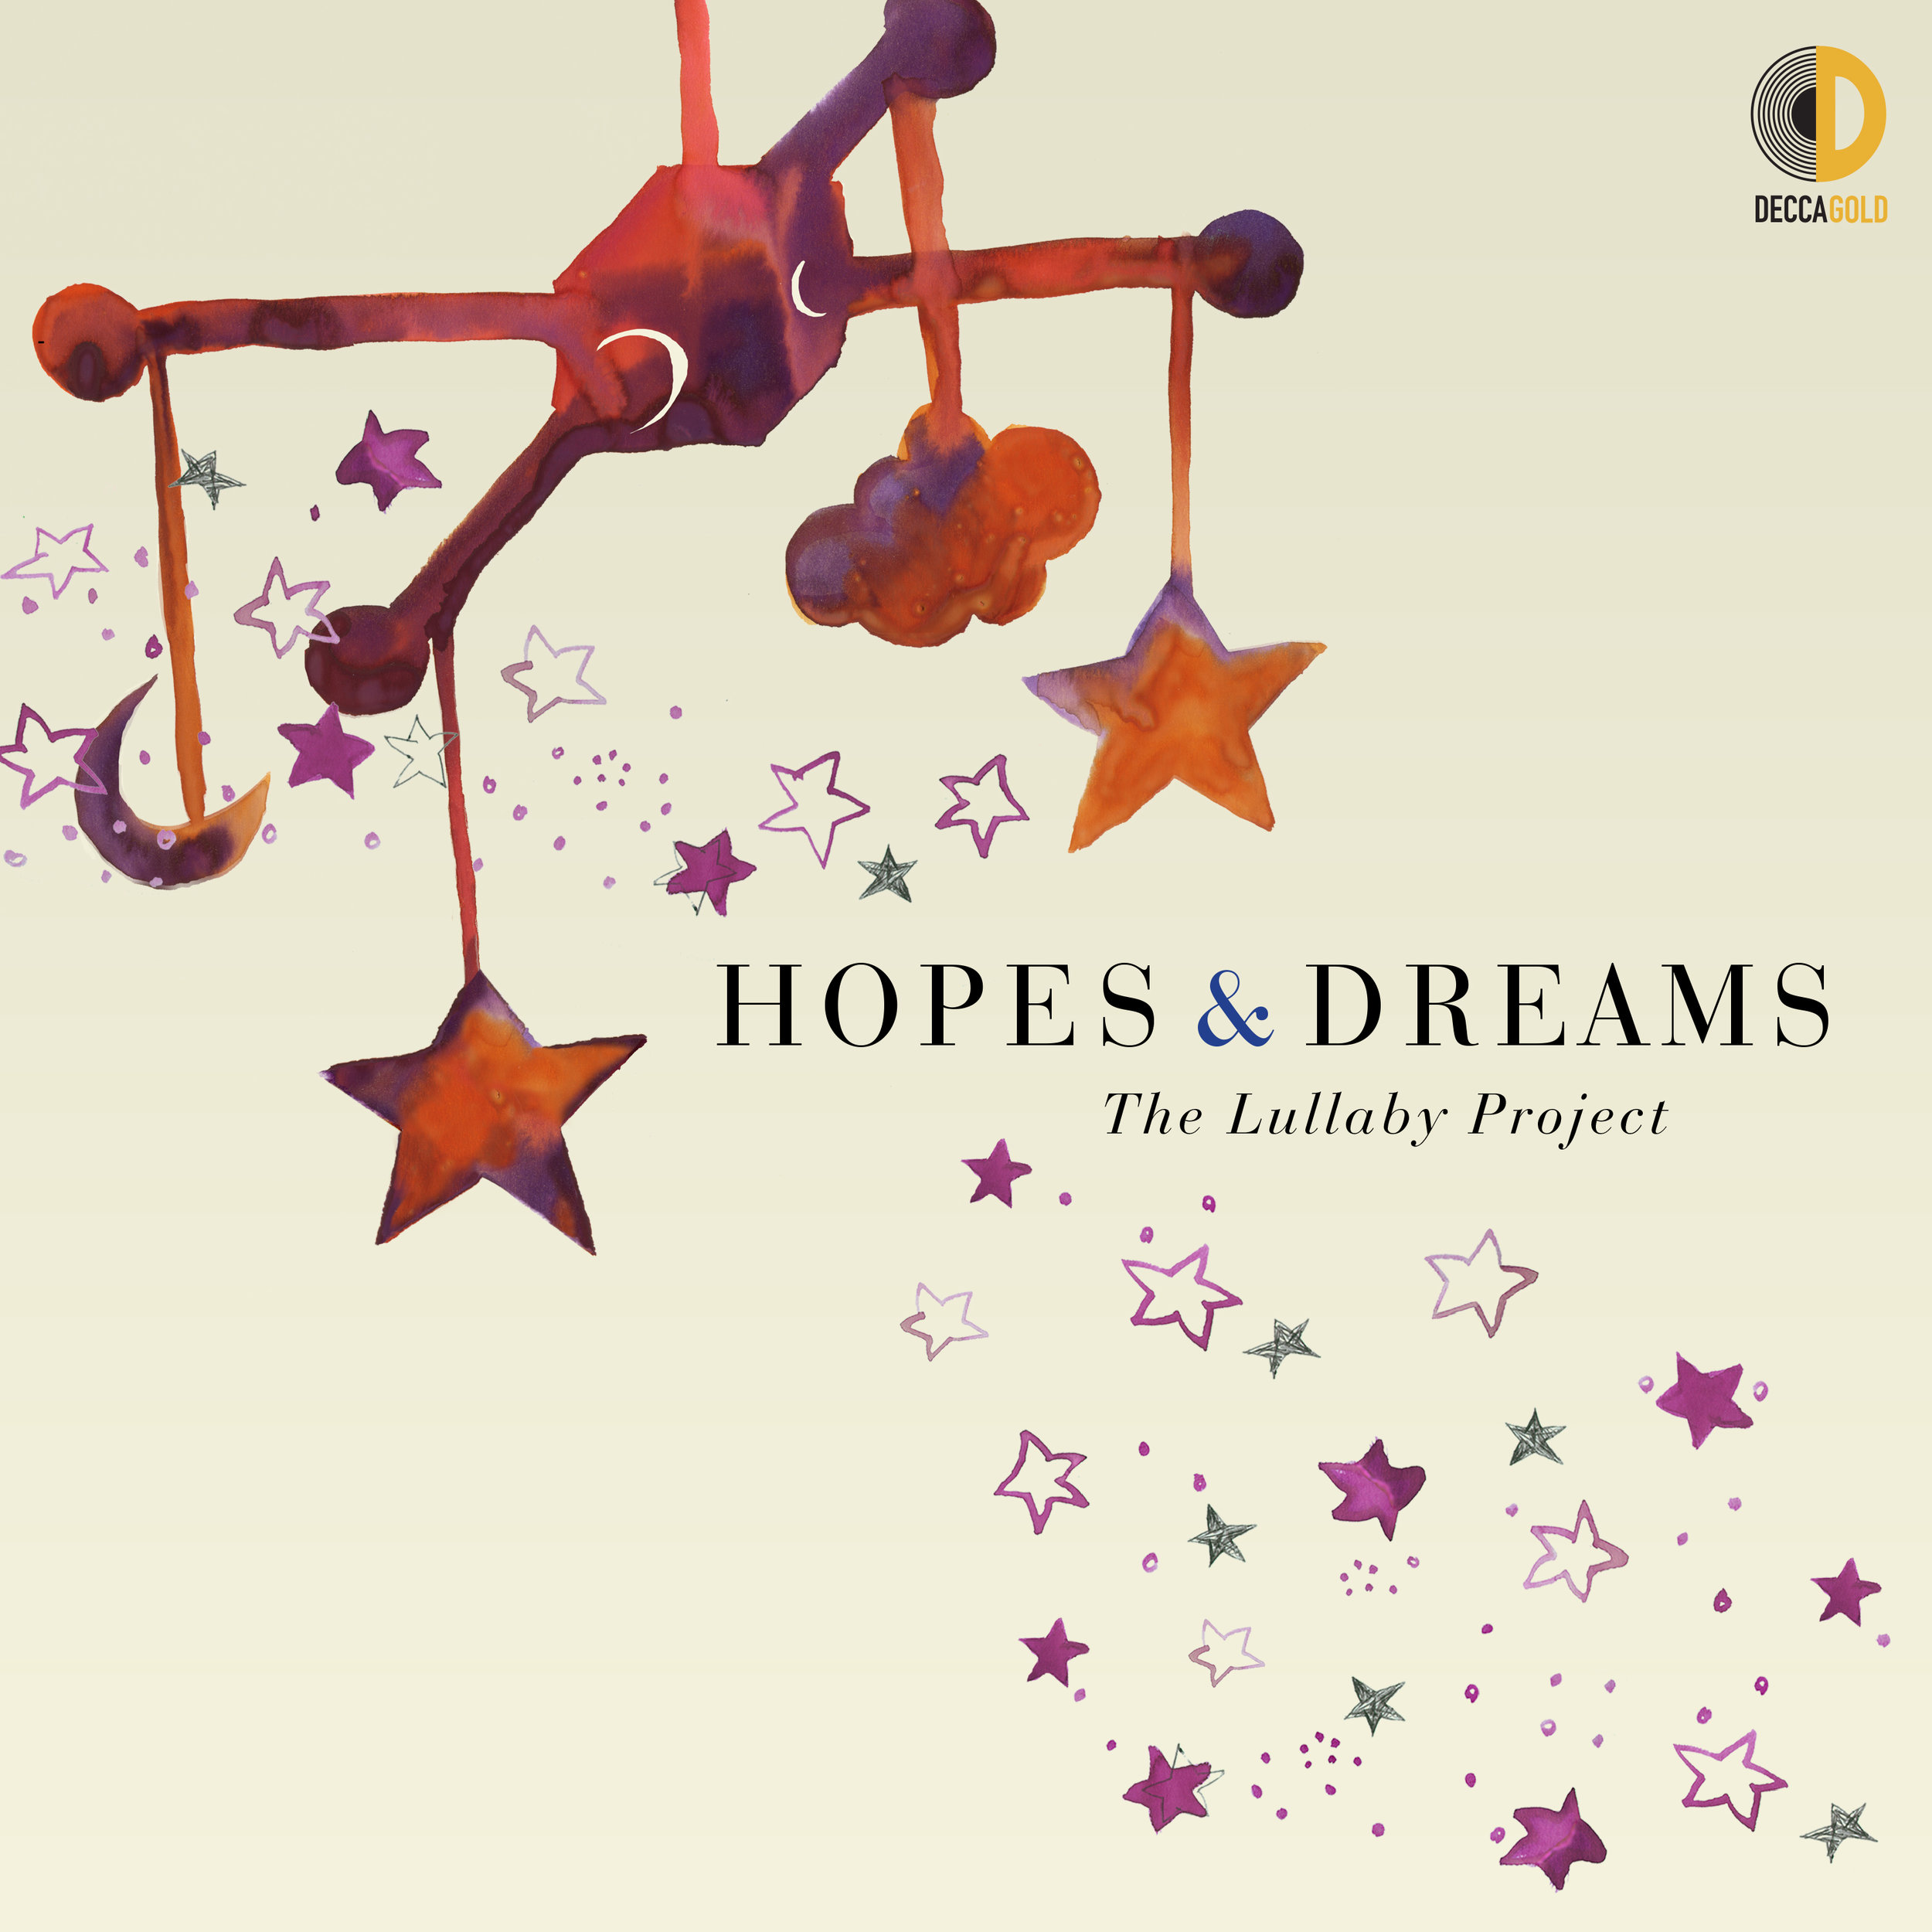 Hopes-and-Dreams-album-cover.jpg